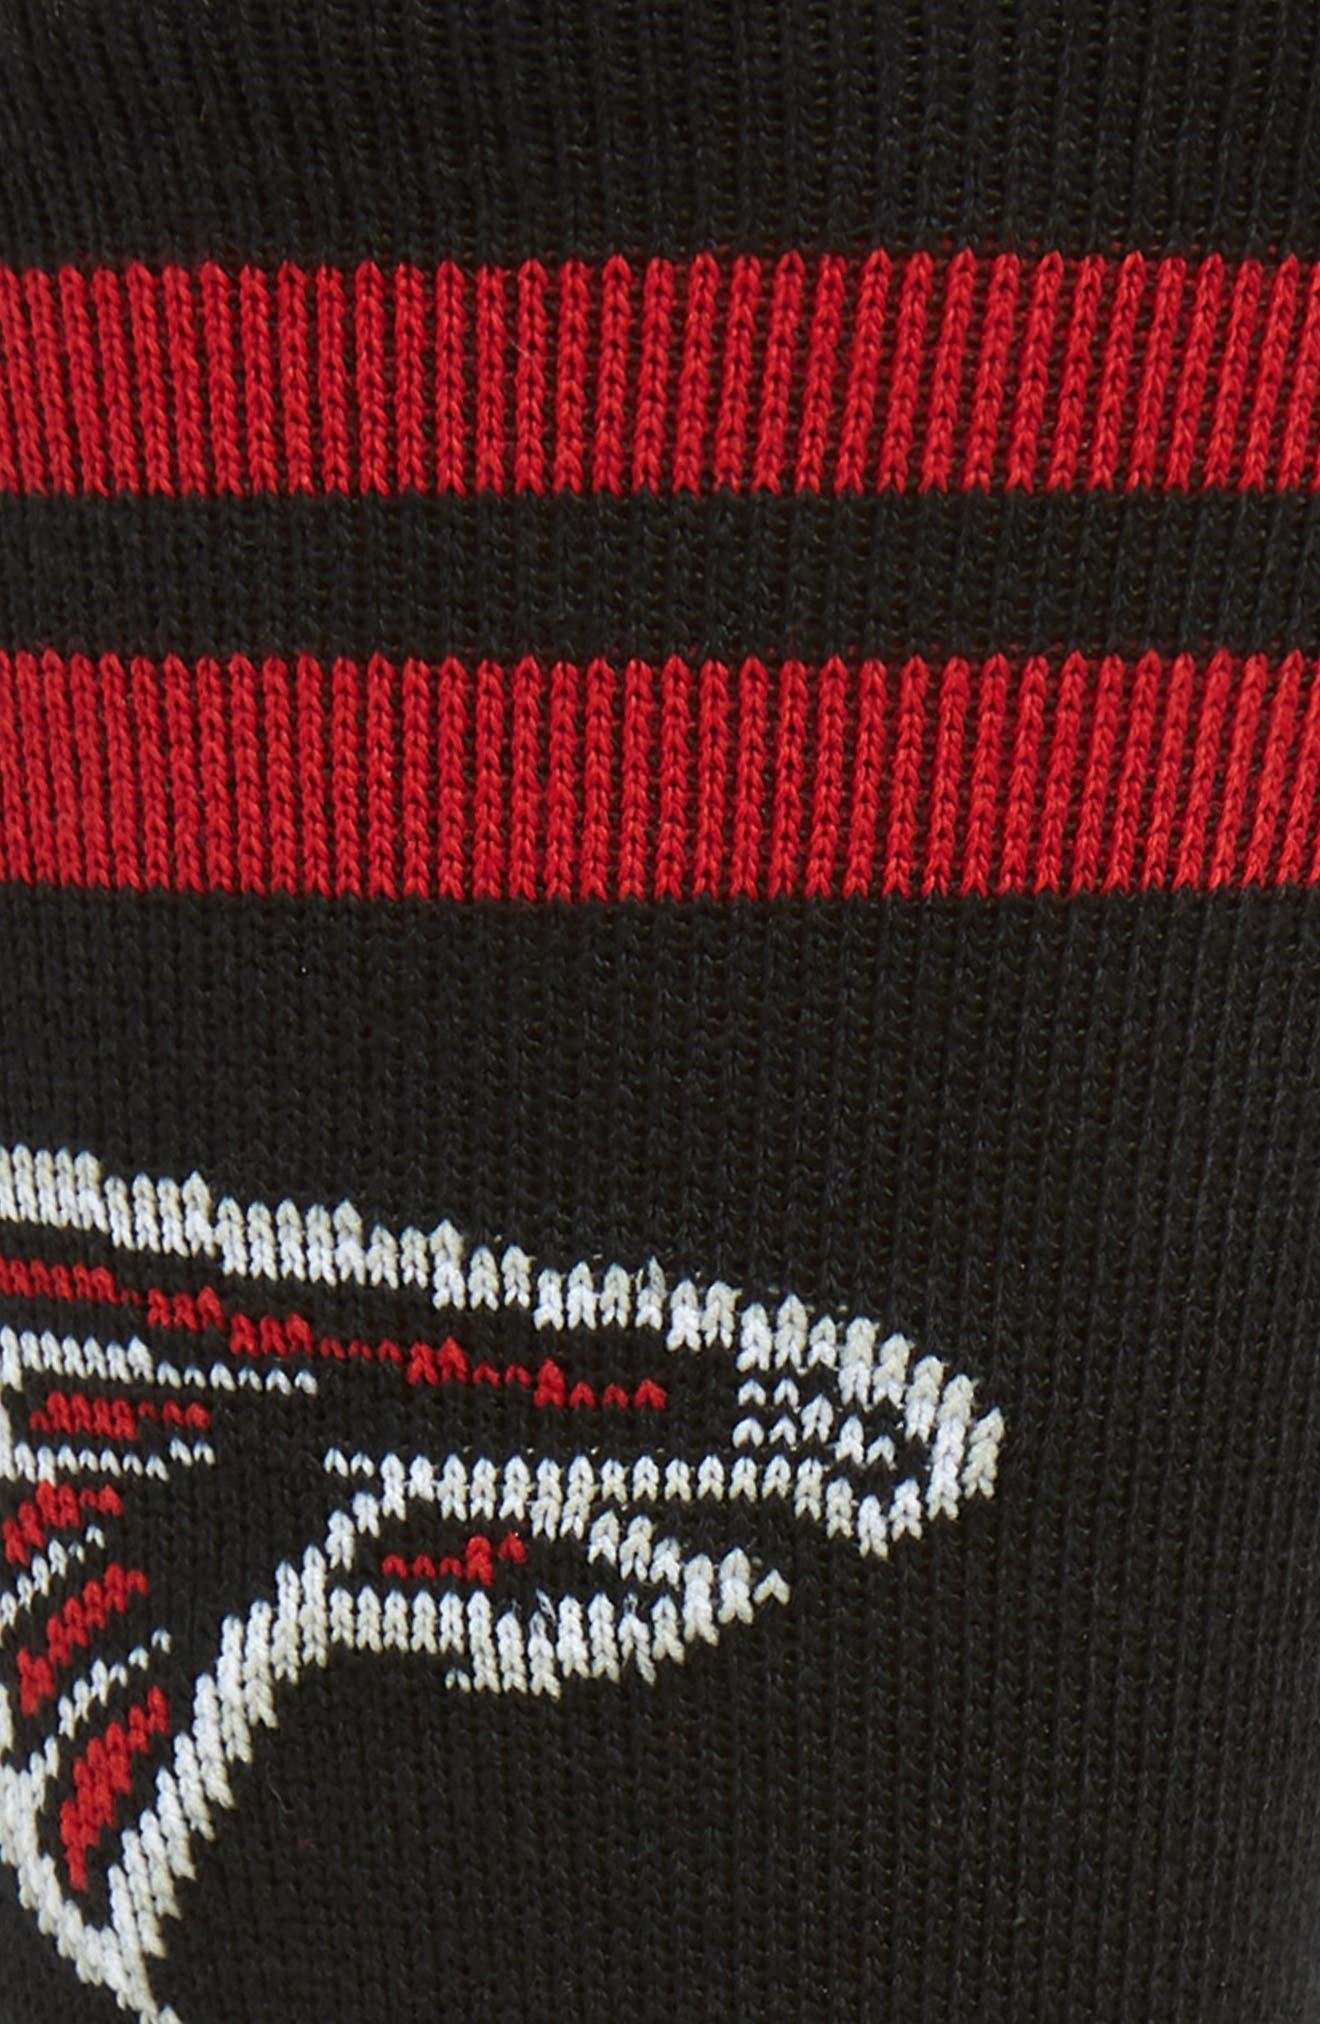 STANCE,                             Atlanta Falcons Socks,                             Alternate thumbnail 2, color,                             RED/ BLACK